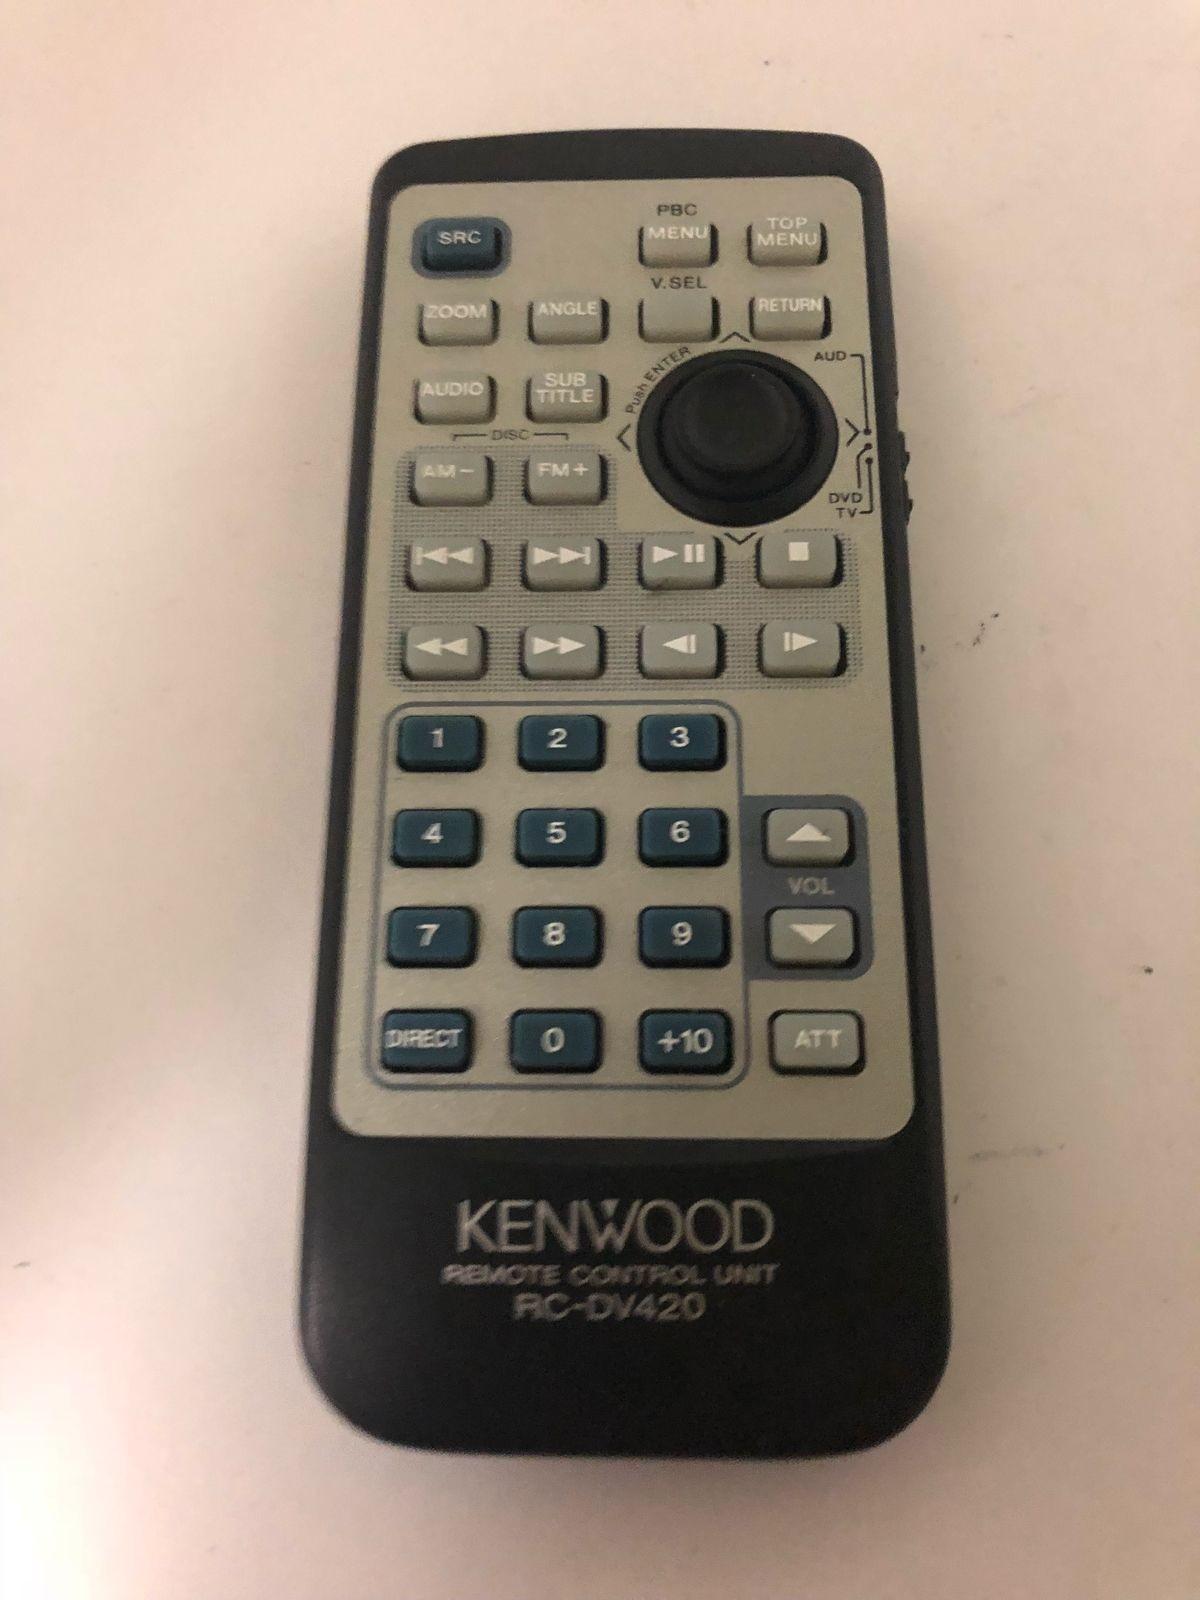 00-74-Used Authentic Toshiba VC-602 Refurbished Remote Control OEM KENWOOD RC-DV420-image